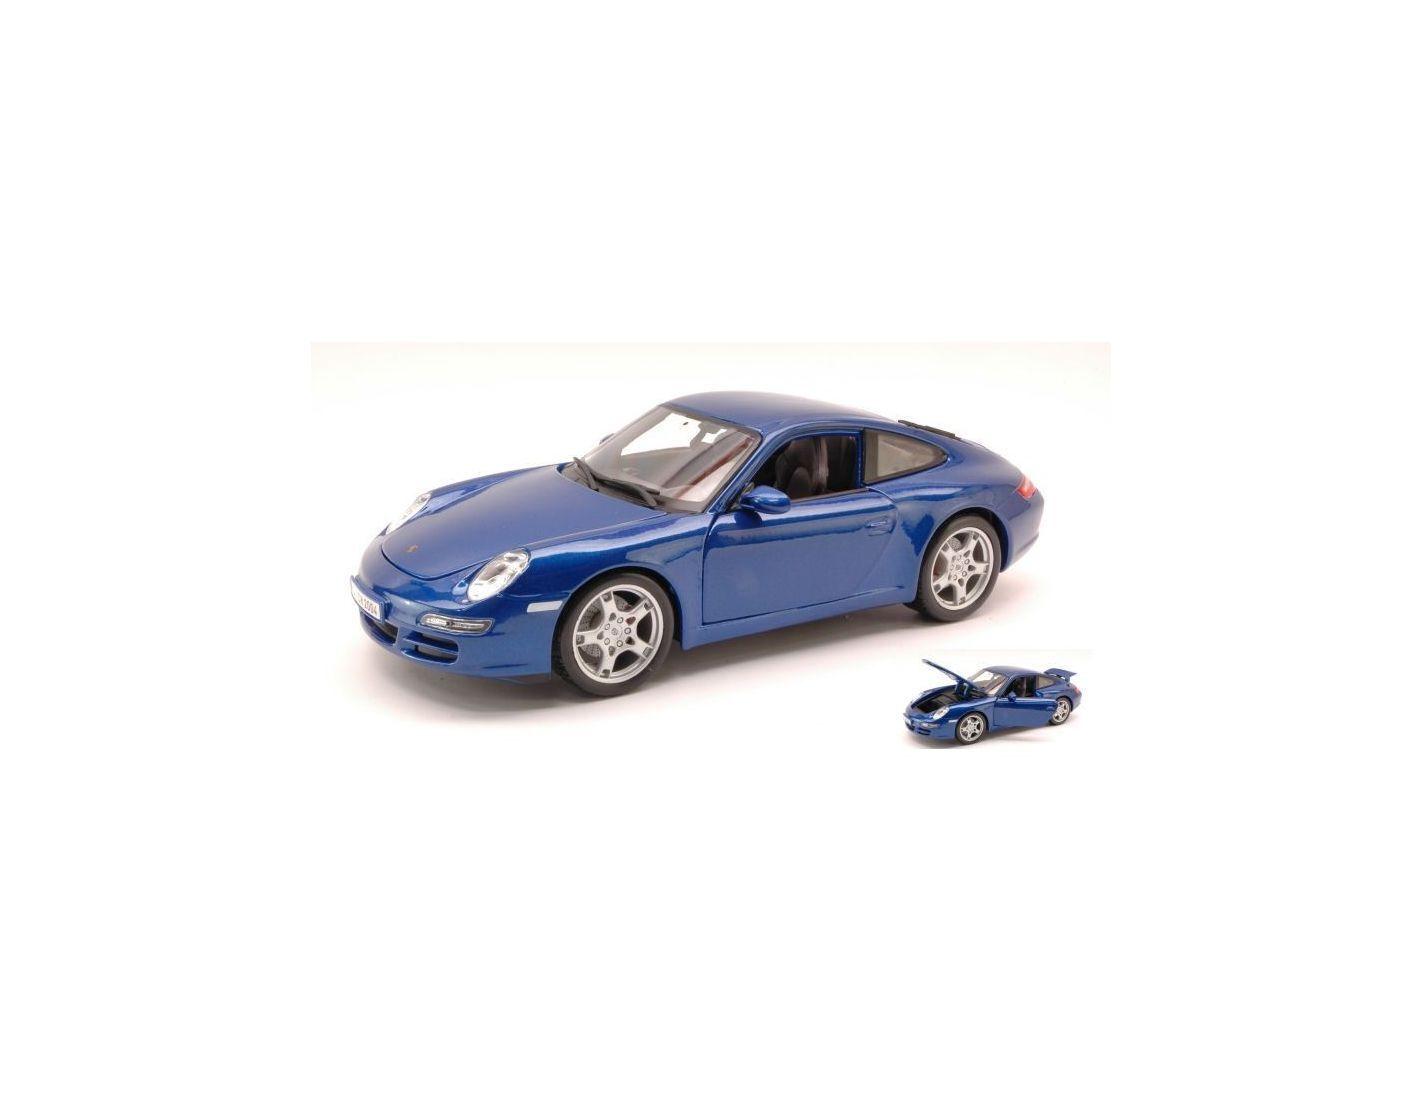 Maisto MI31692 PORSCHE 911 CARRERA S 997 2005 METALLIC blueE 1 18 Modellino